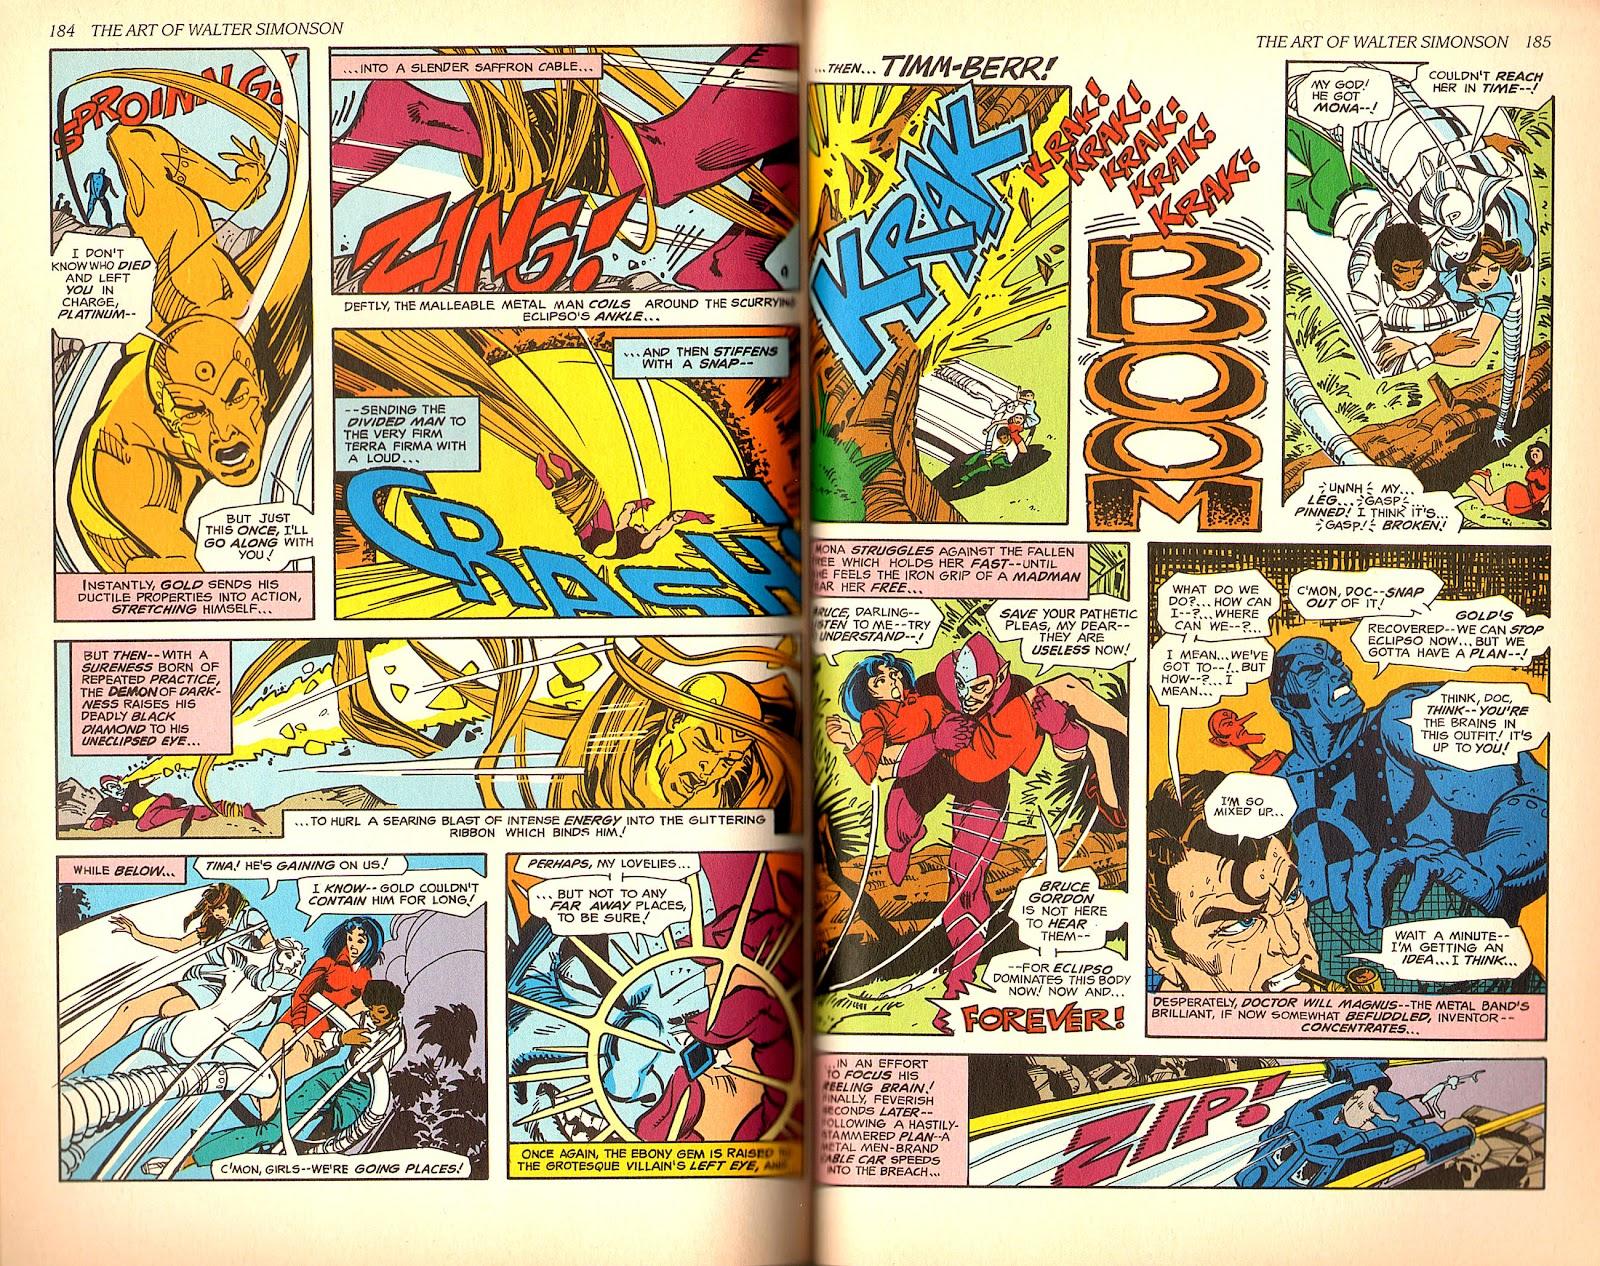 Read online The Art of Walter Simonson comic -  Issue # TPB - 94